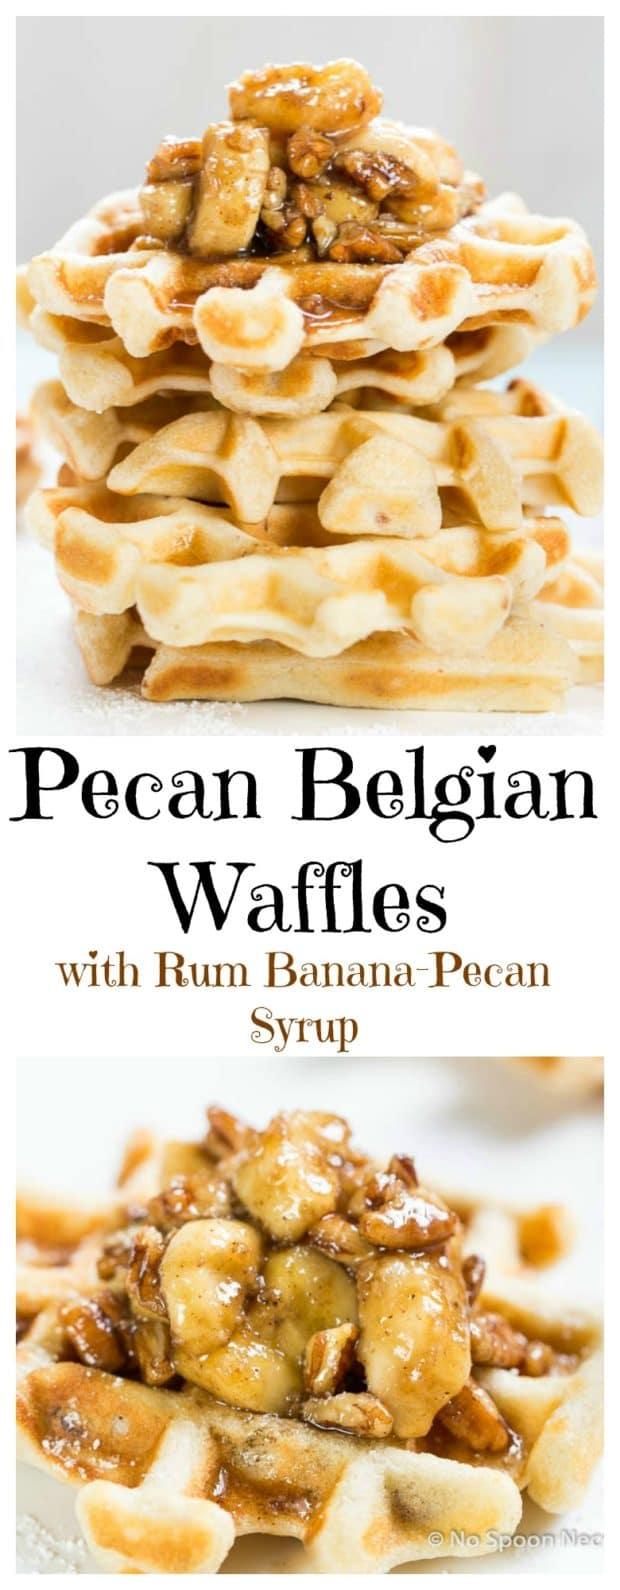 Pecan Belgium Waffles